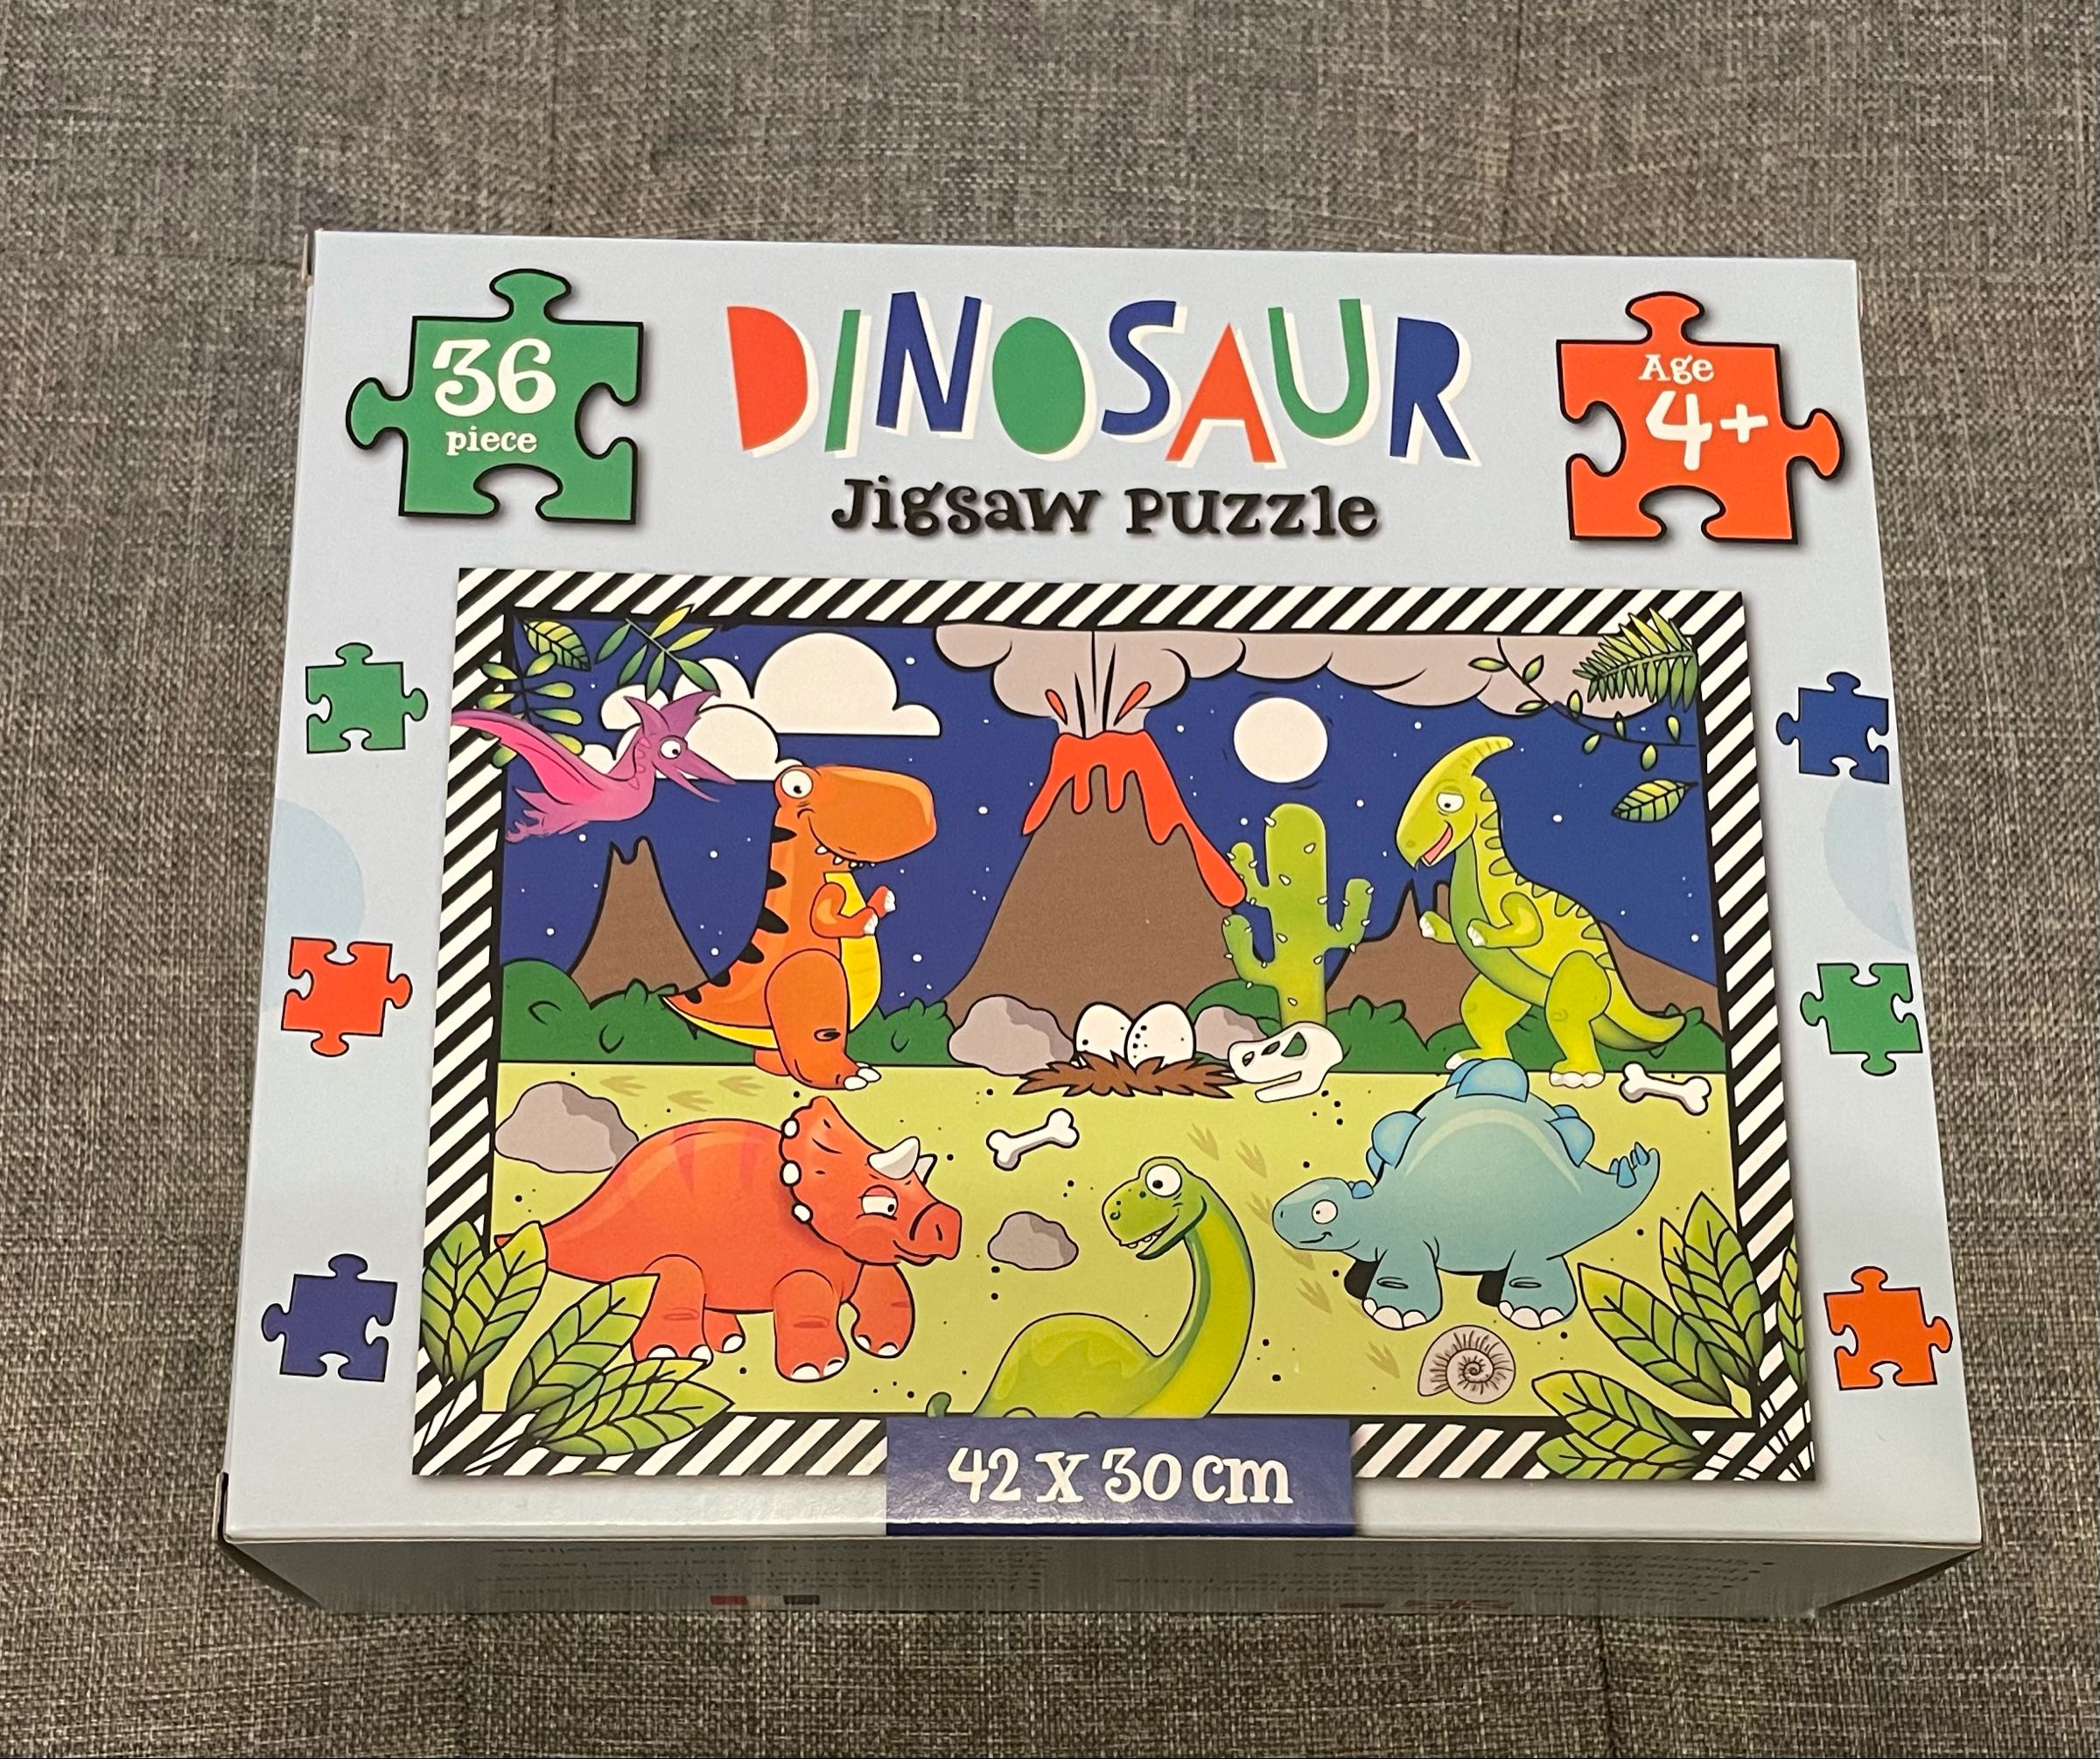 Dinosaur jigsaw puzzle 42 x30cm 36 pieces